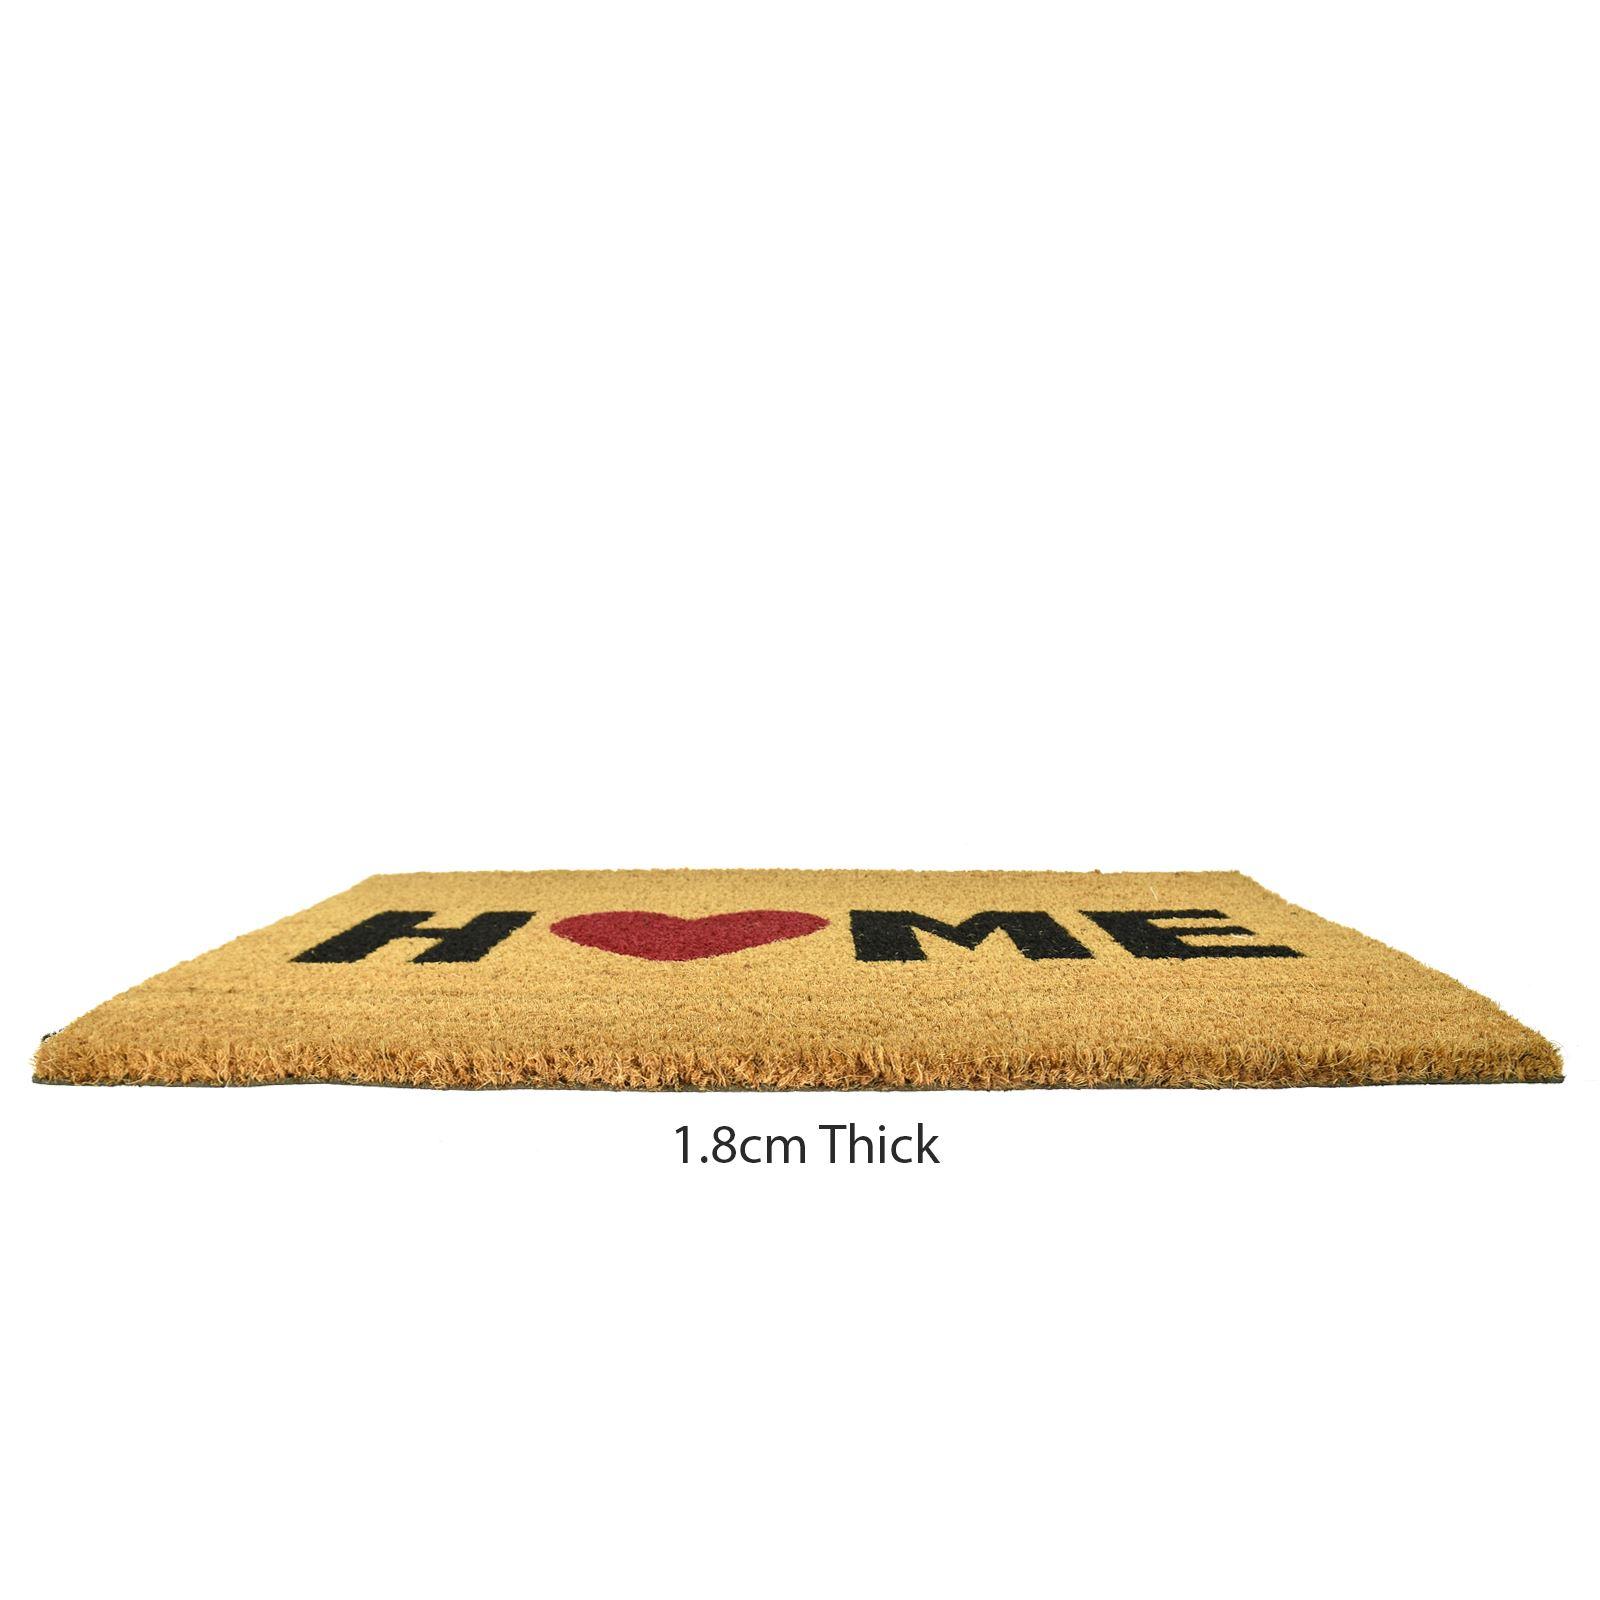 Plain-Non-Slip-Door-Mat-Tough-Natural-Coir-PVC-Back-Welcome-Doormat-40-x-60cm miniatura 52